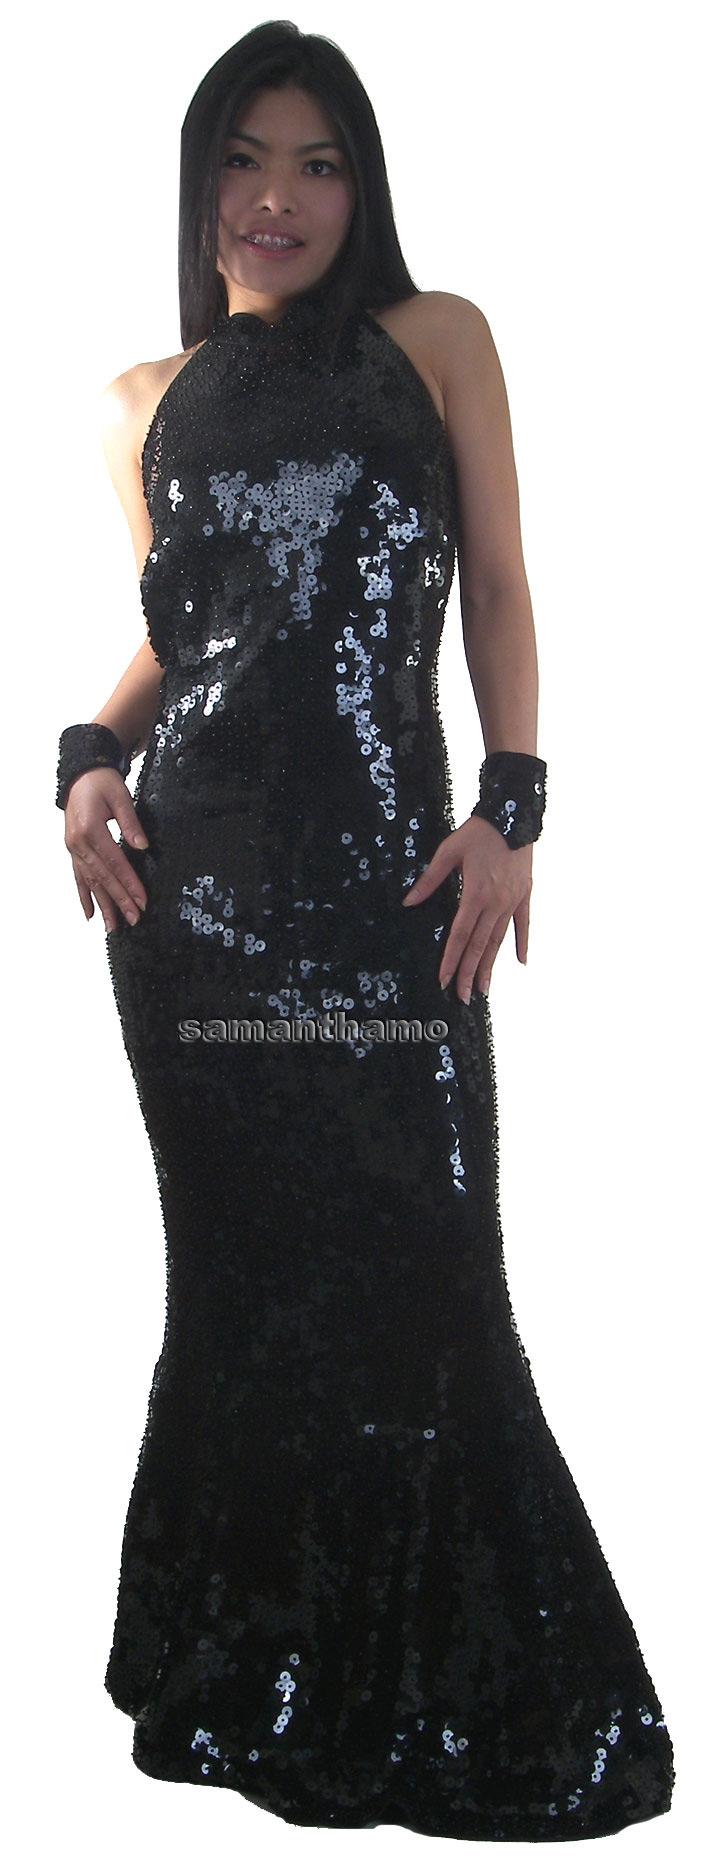 https://michaeljacksoncelebrityclothing.com/sequin-ball-gown/TM2002-black-sequin-long-dress-halter-top.jpg